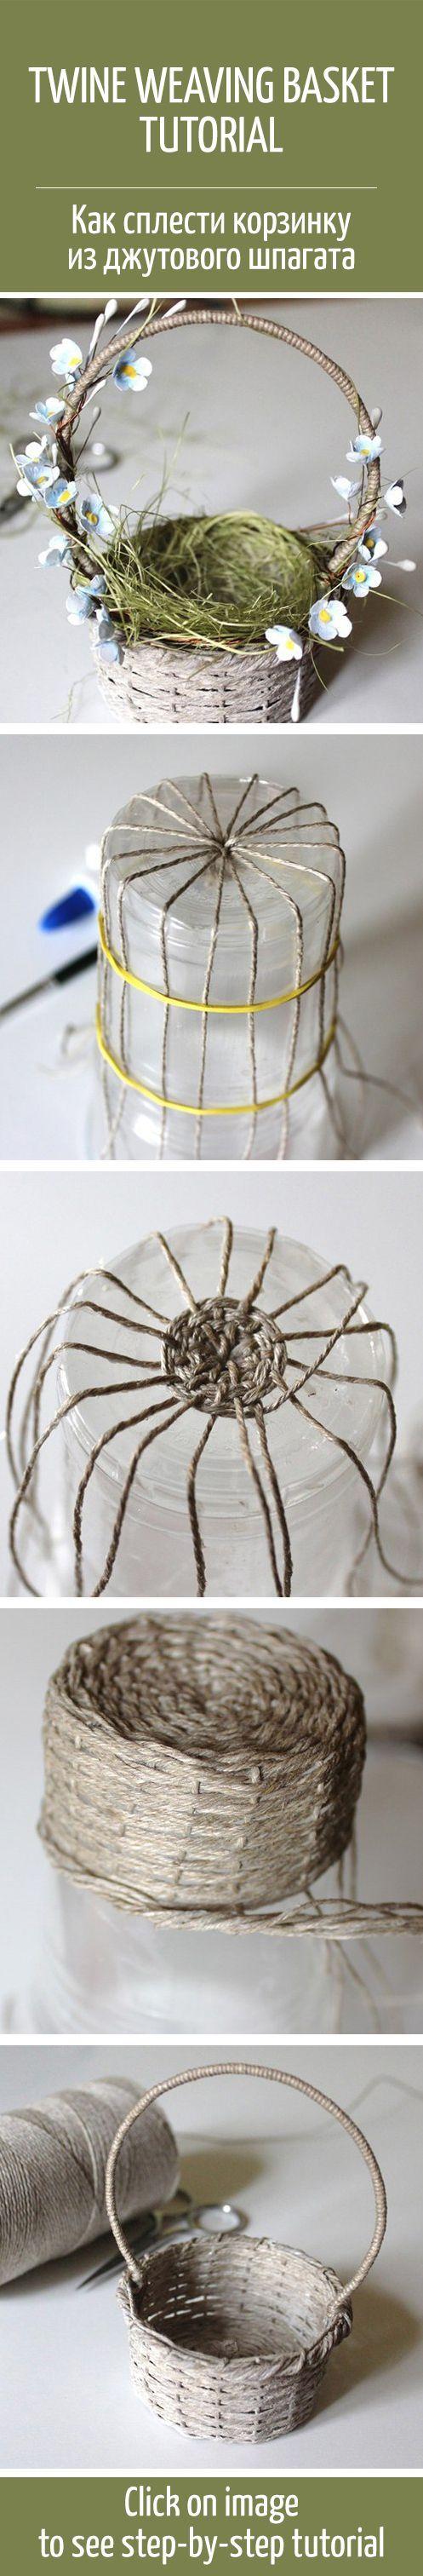 Twine weaving basket tutorial                                              Handmade  Home. 25  best ideas about Handmade home decor on Pinterest   Handmade